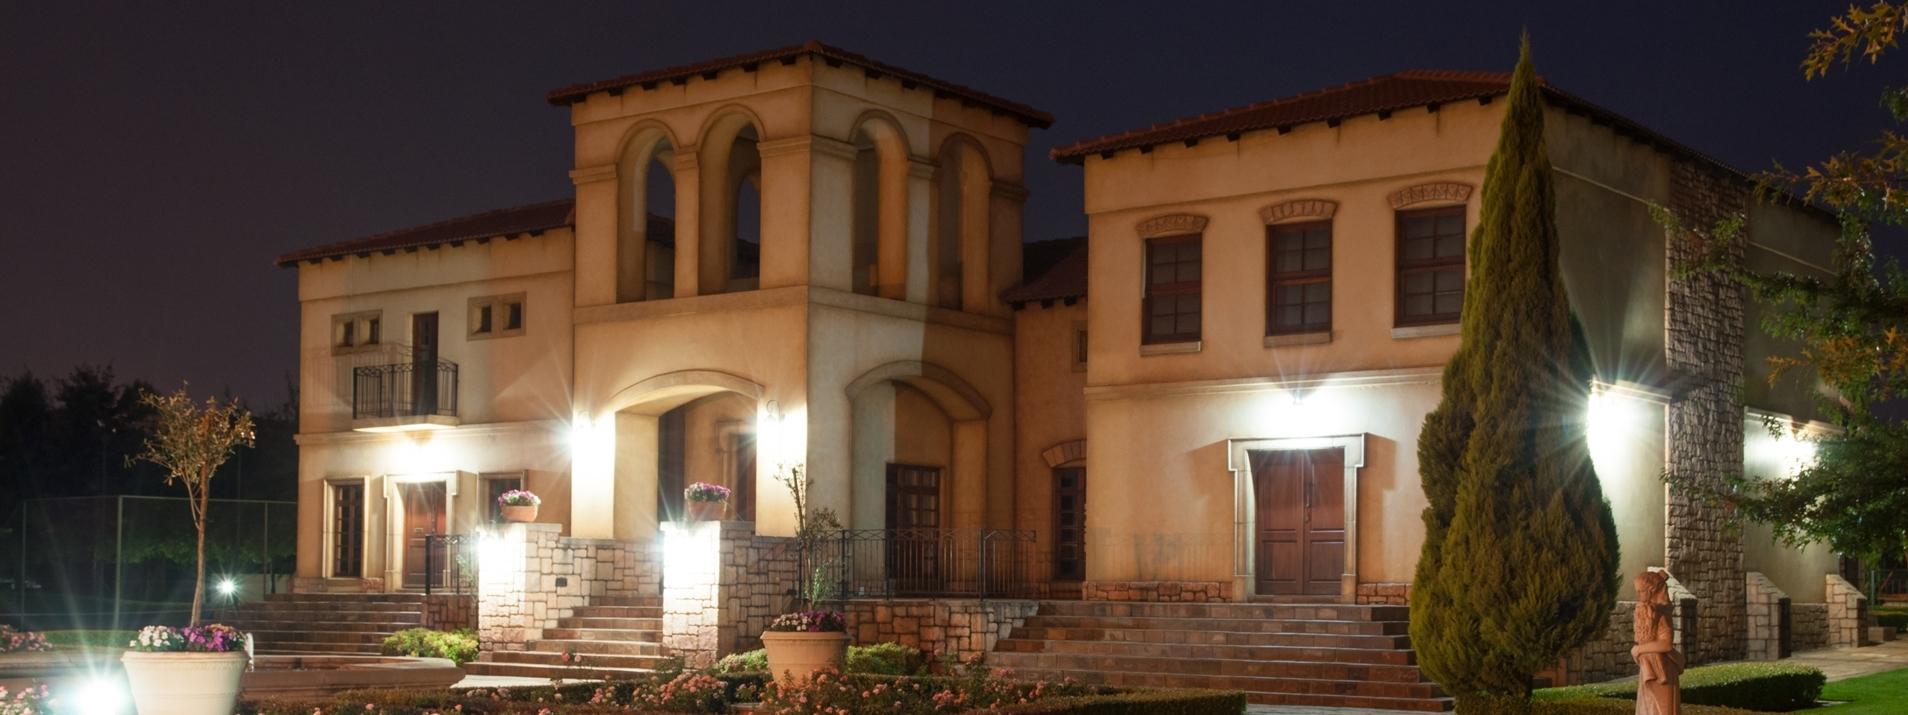 Professional Photographers in Pretoria and Gauteng